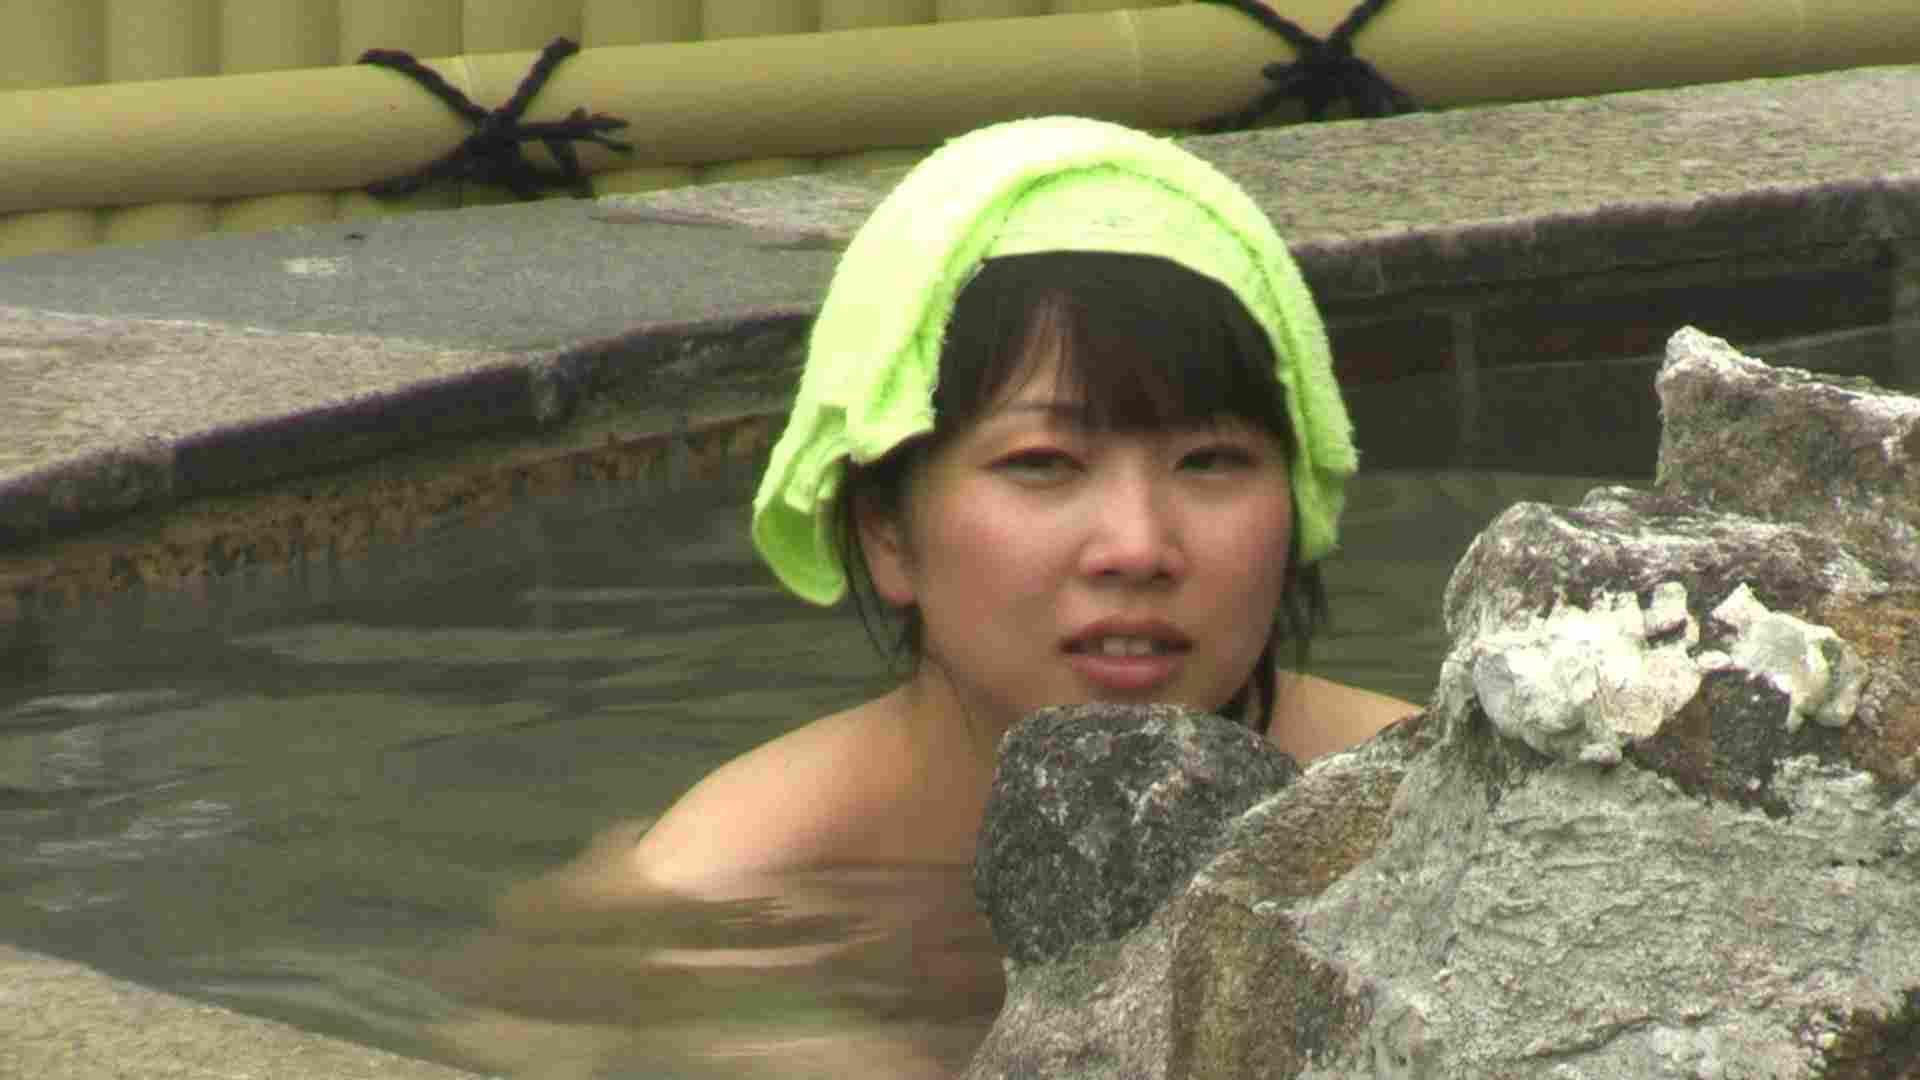 Aquaな露天風呂Vol.671 盗撮シリーズ | 露天風呂編  78PIX 59